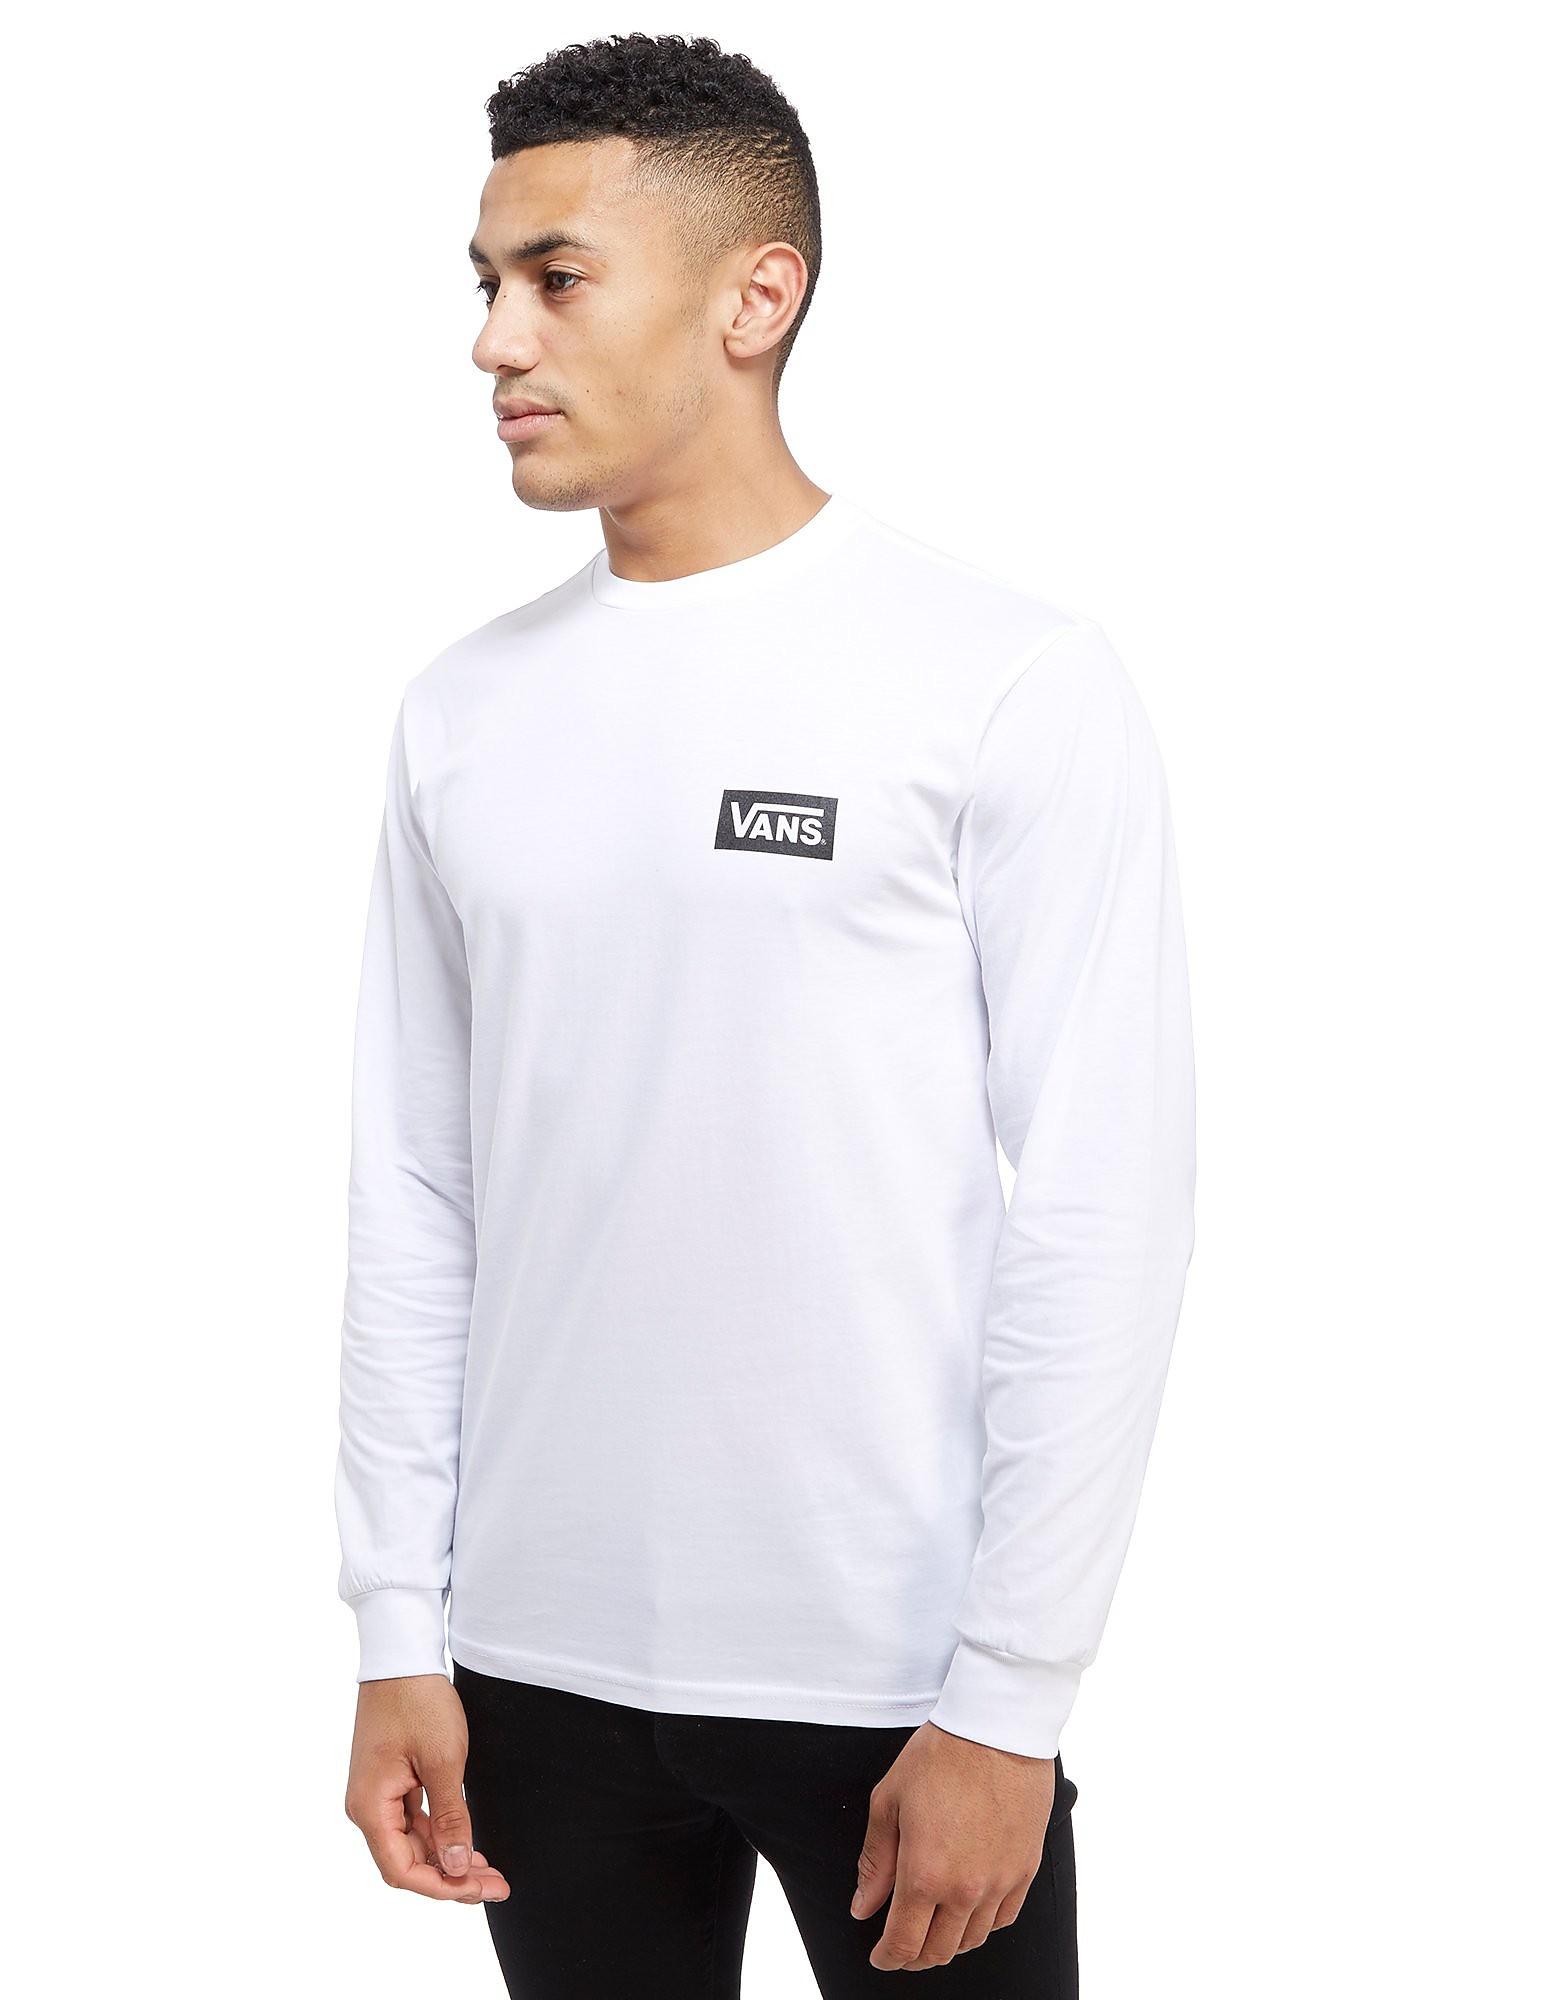 Vans Big Back Long-Sleeved T-shirt